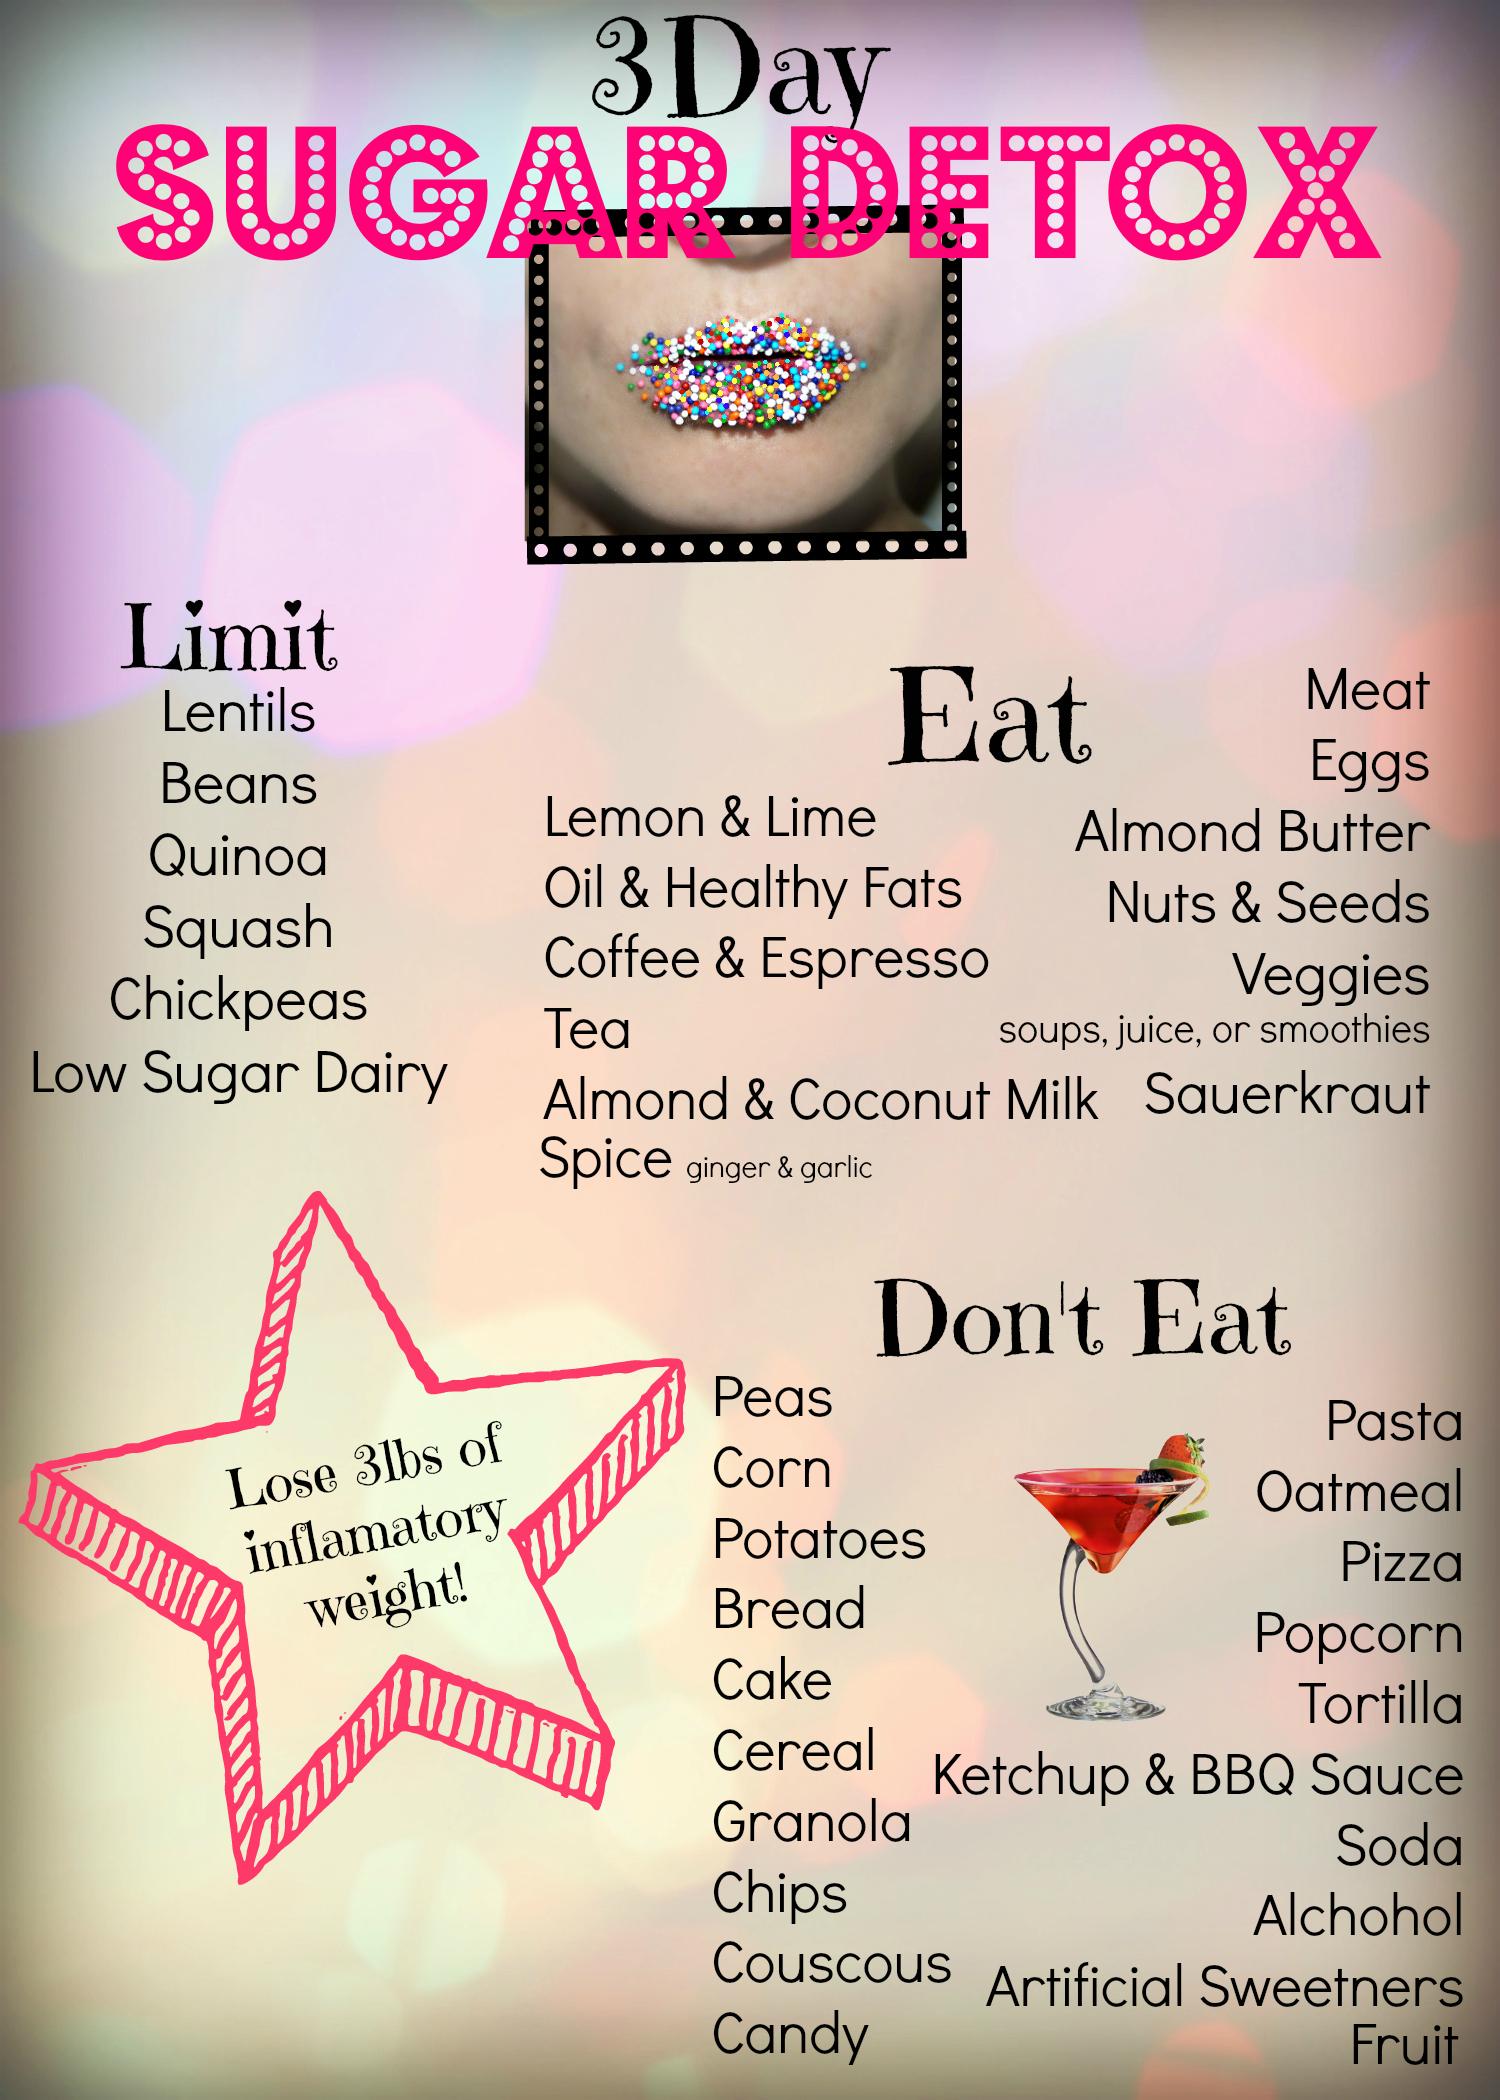 Dietary Plan According To Bmi